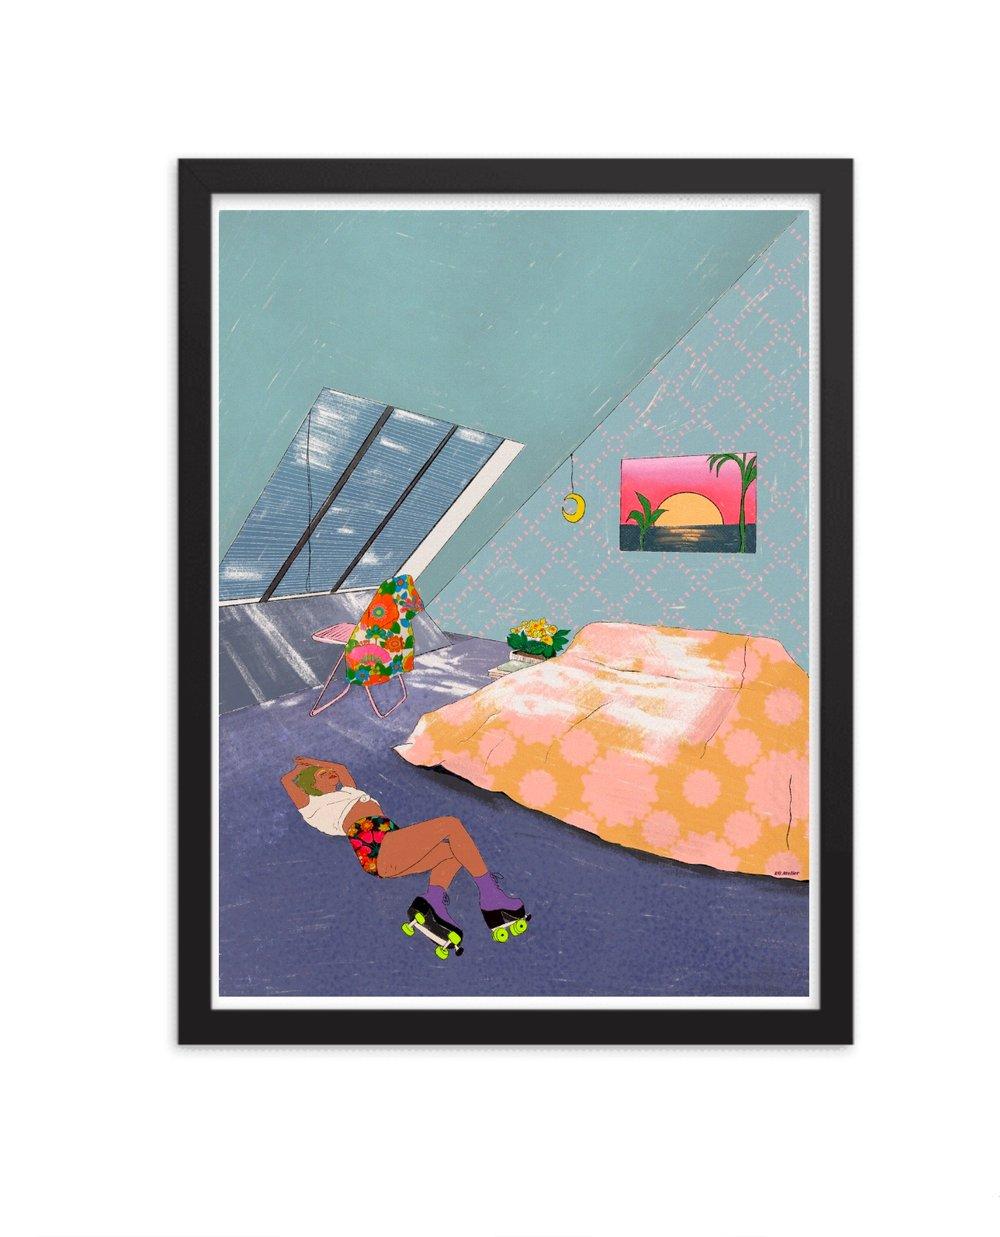 Image of Self Isolation Print